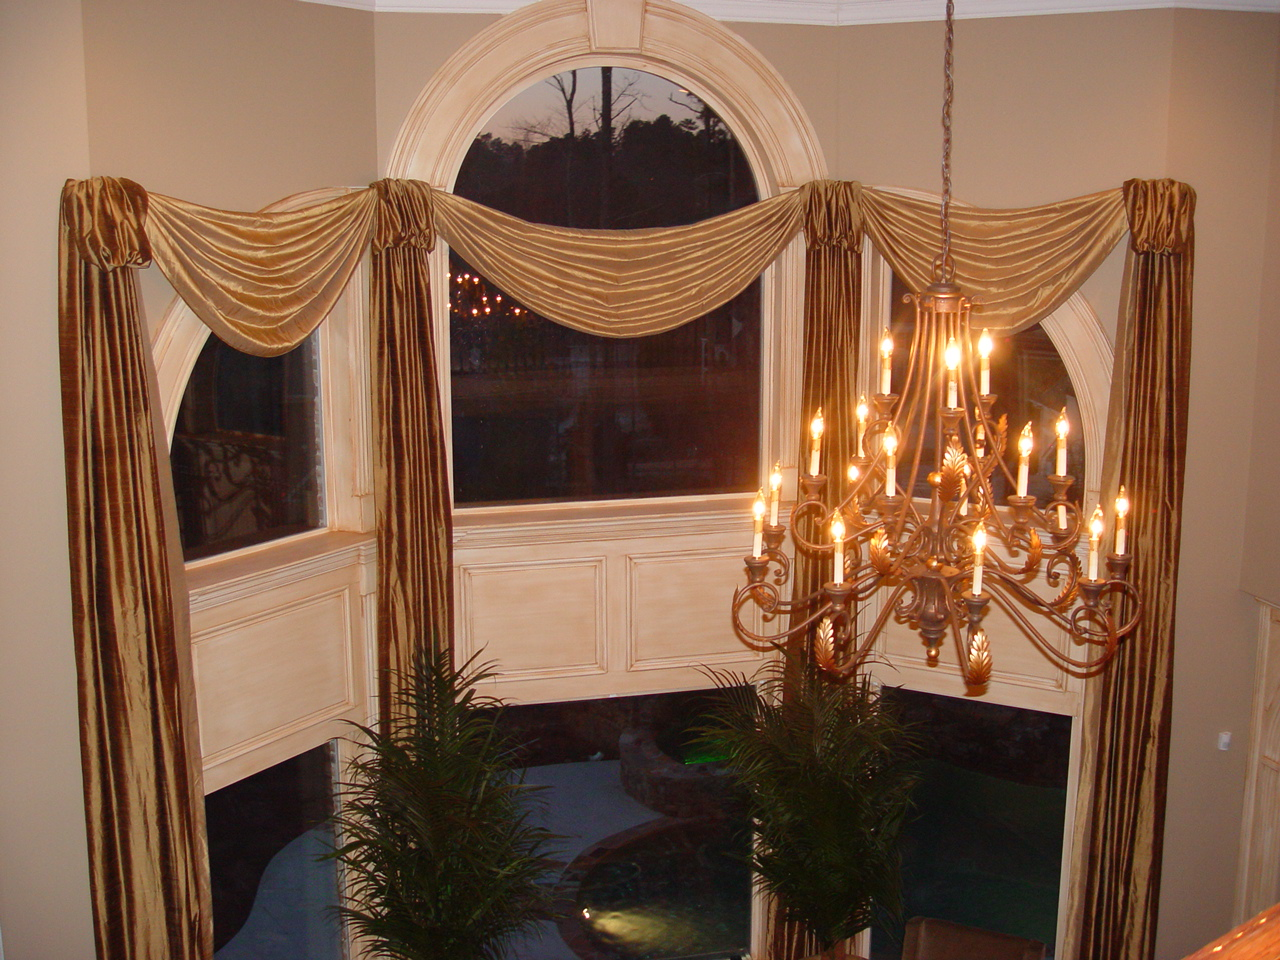 custom-blinds-drapery-shades-interior-design-atlanta-georgia-20.jpg